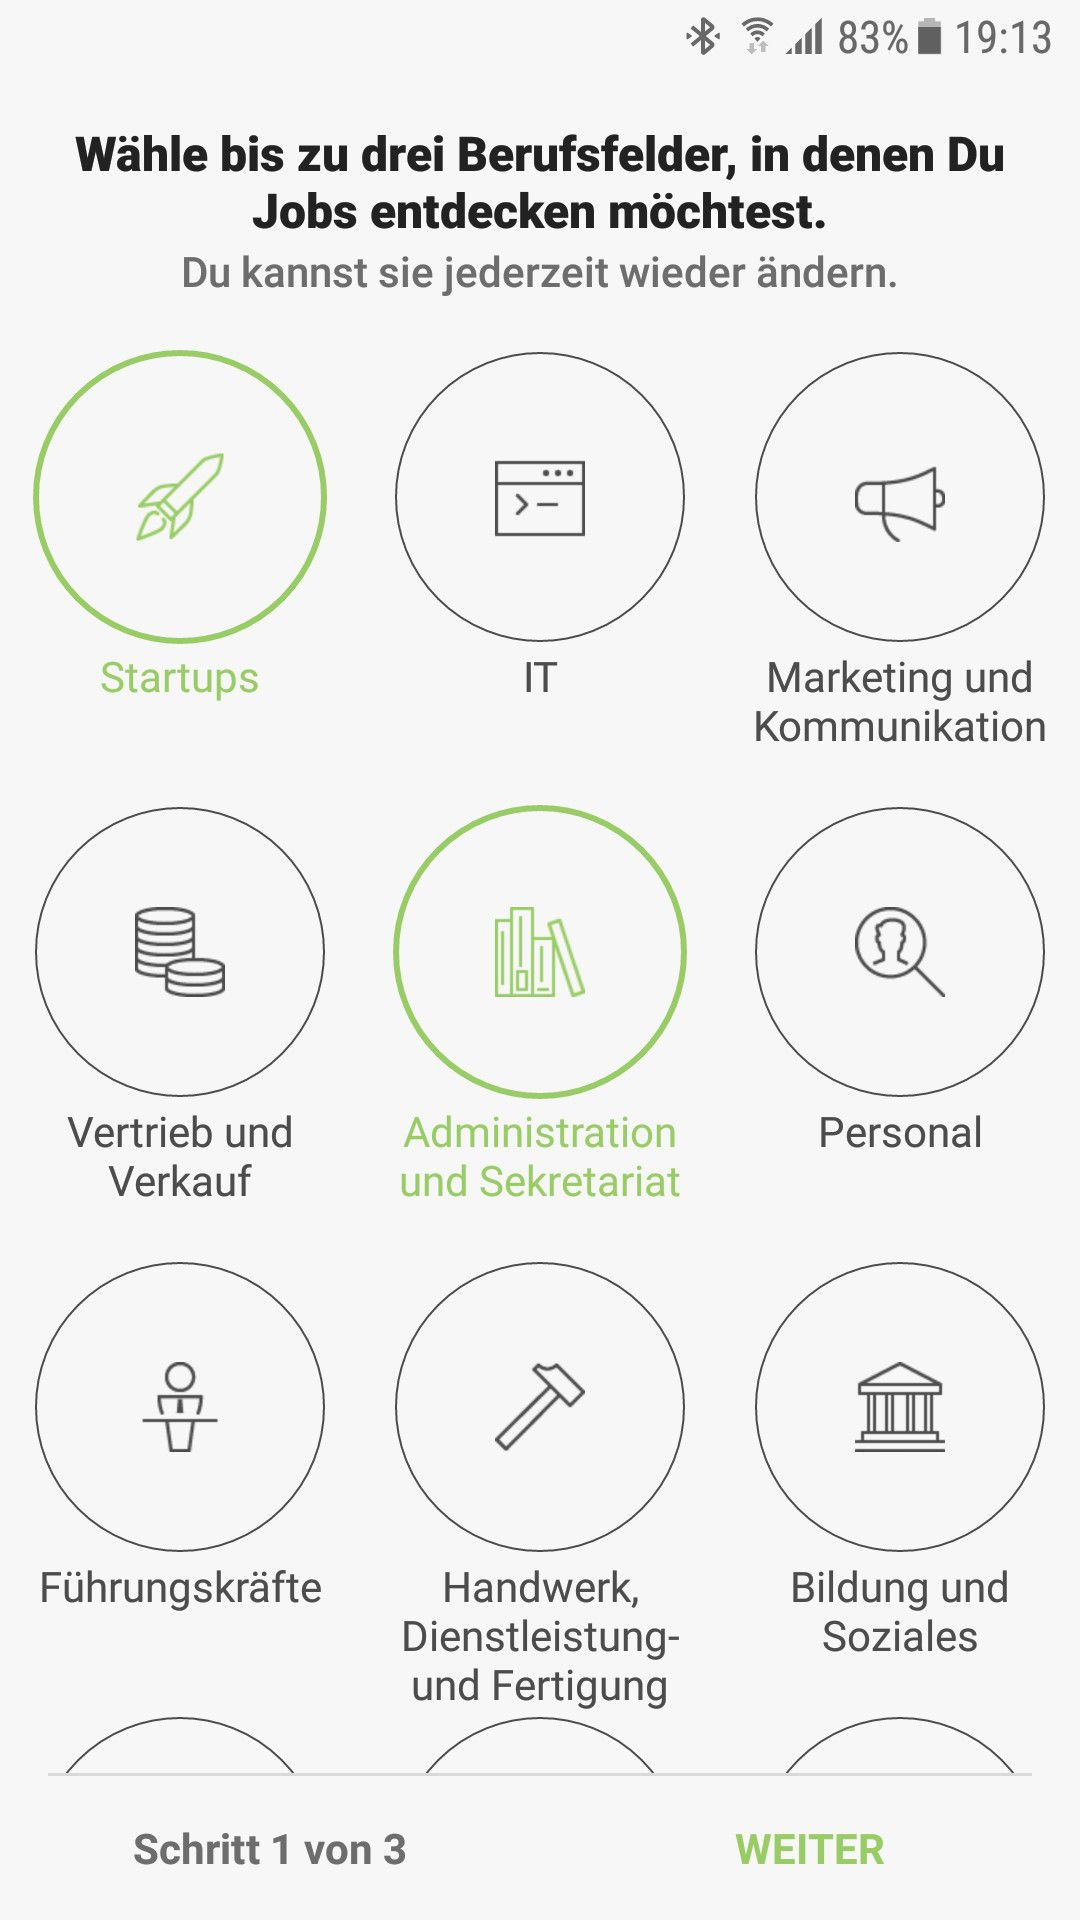 Truffls Jobbörse: Jobs swipen und per App bewerben